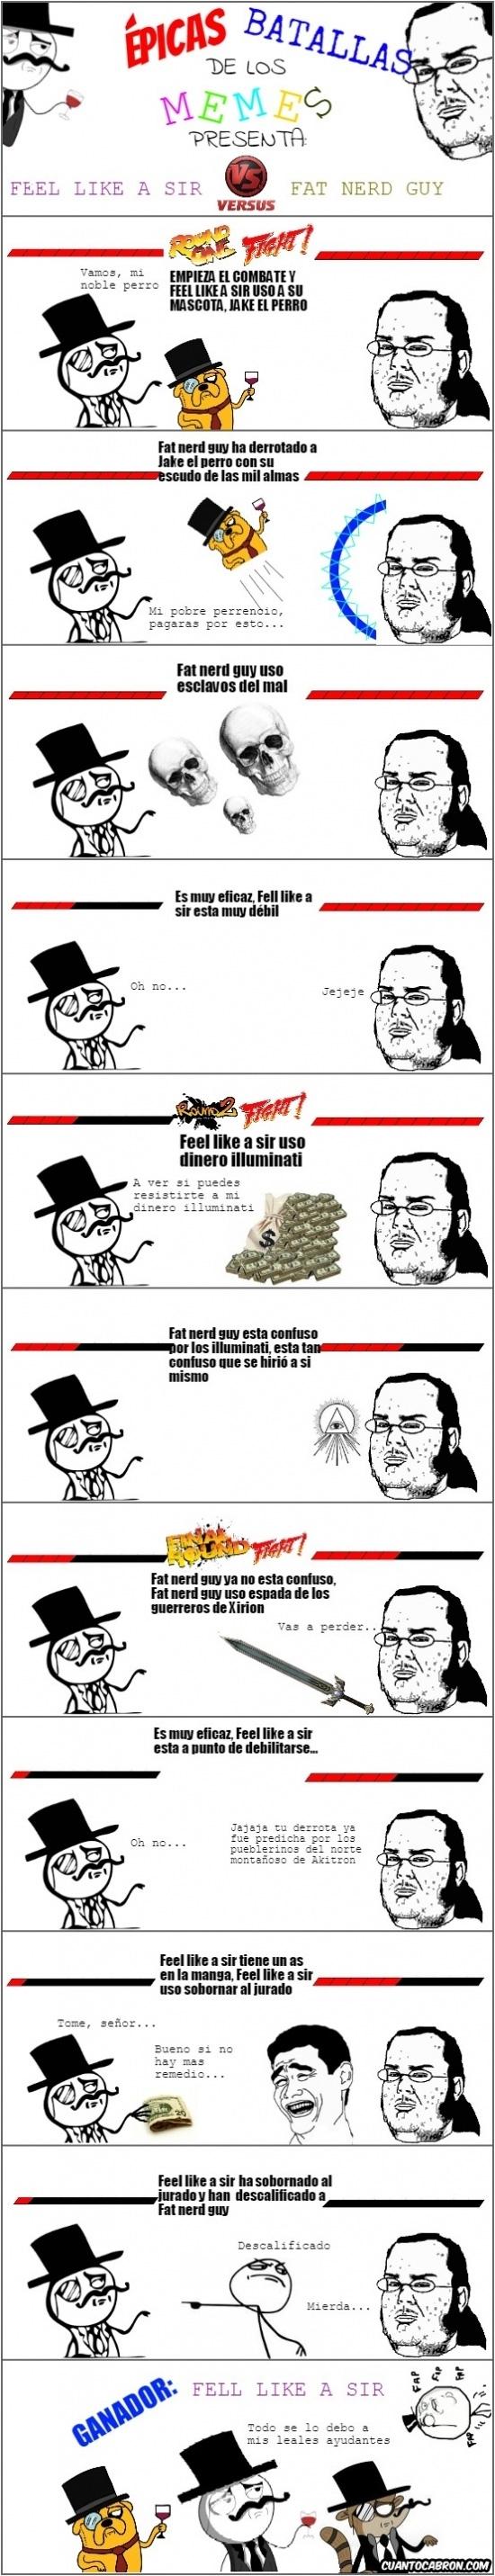 Mix - Épicas batallas de los memes: Feel like a sir vs. Friki